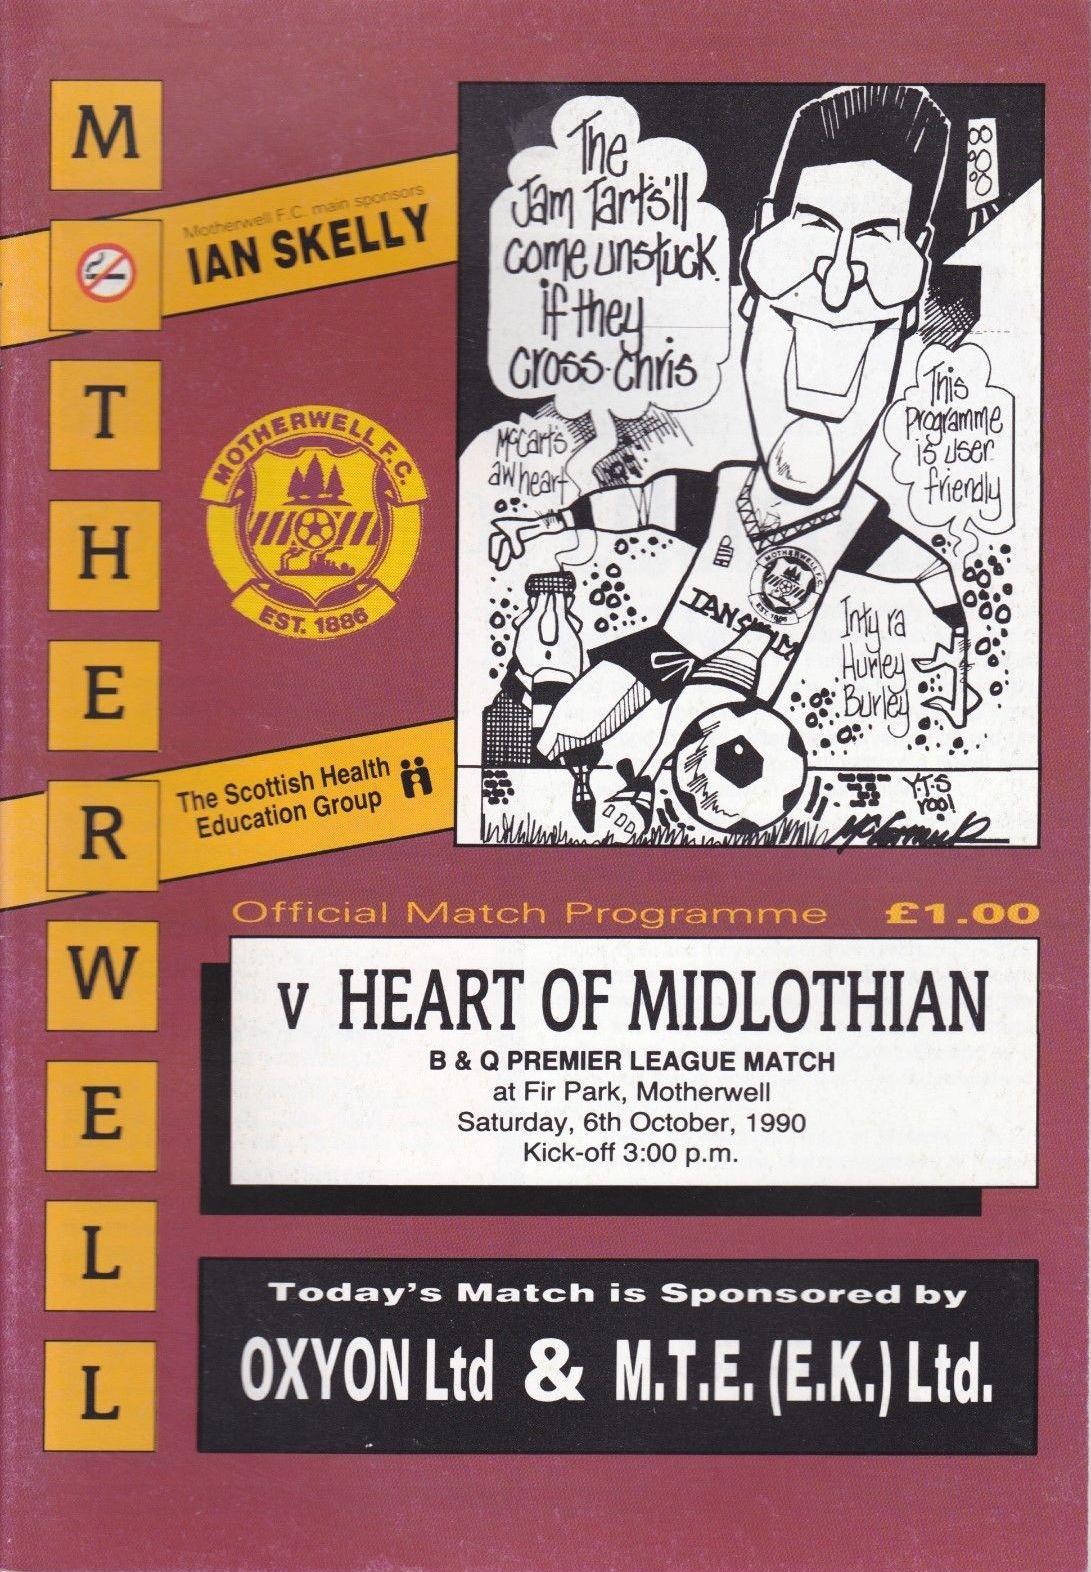 versus Hearts Programme Cover